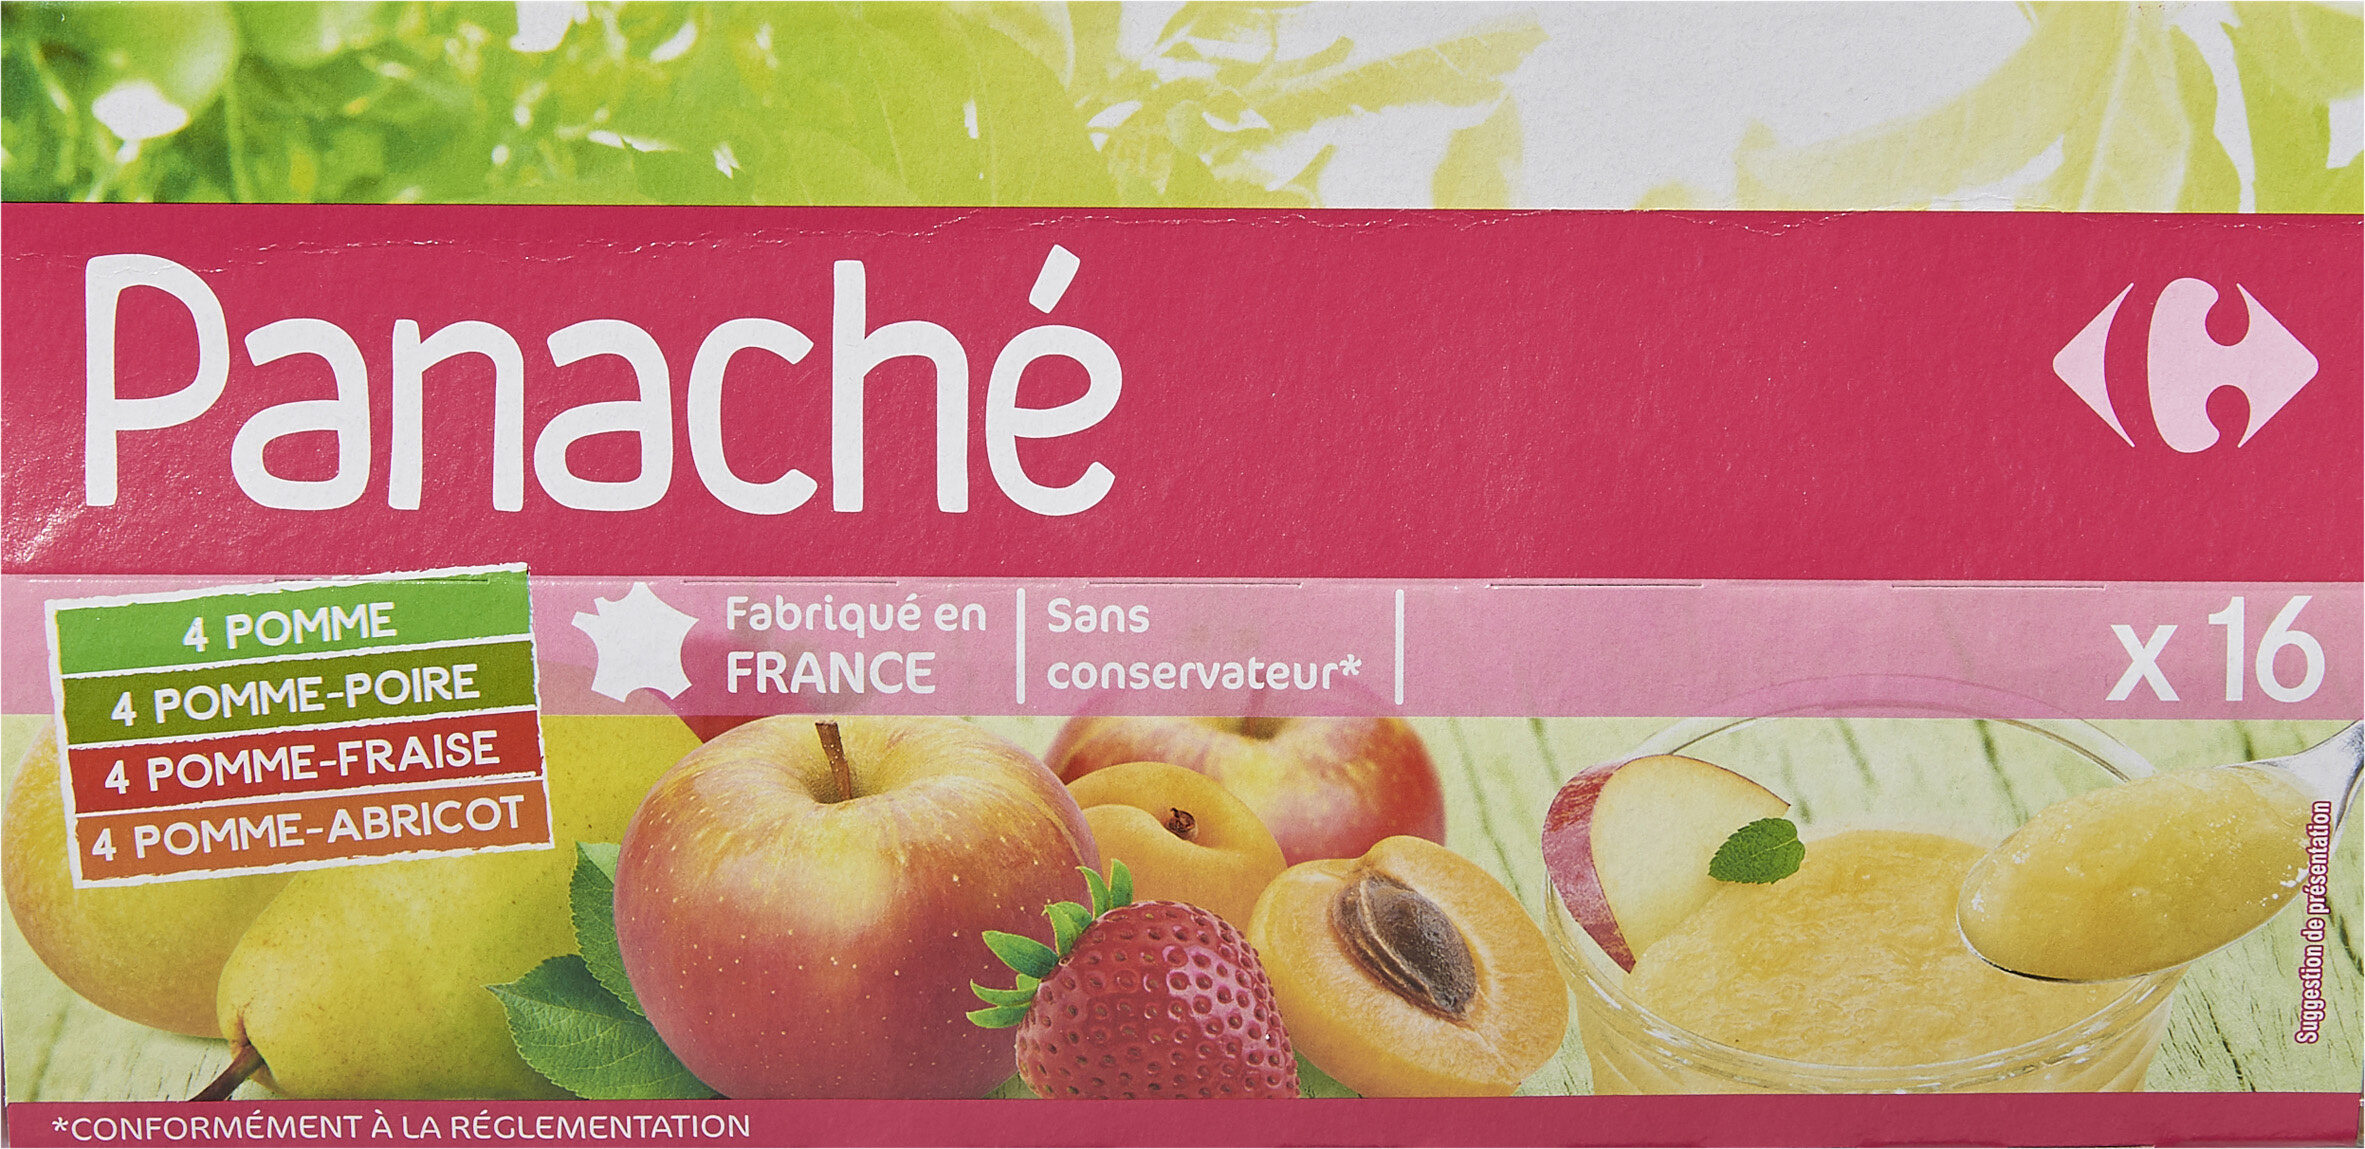 Panaché - Produit - fr